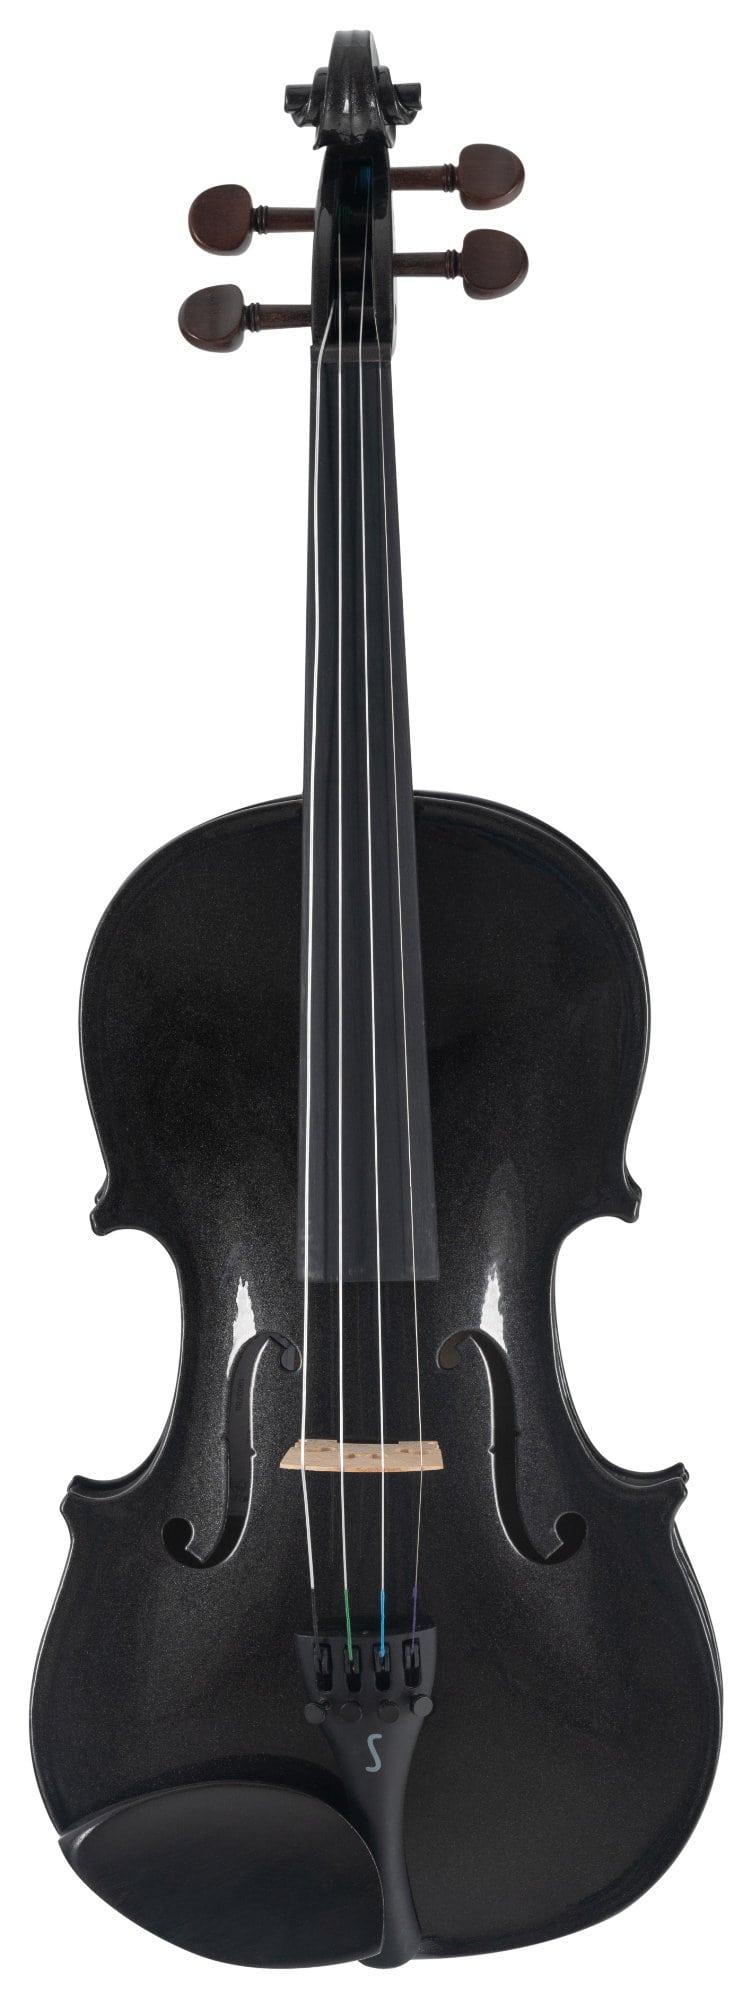 Violinen - Stentor SR1401 Harlequin Violinset 4|4 BK - Onlineshop Musikhaus Kirstein